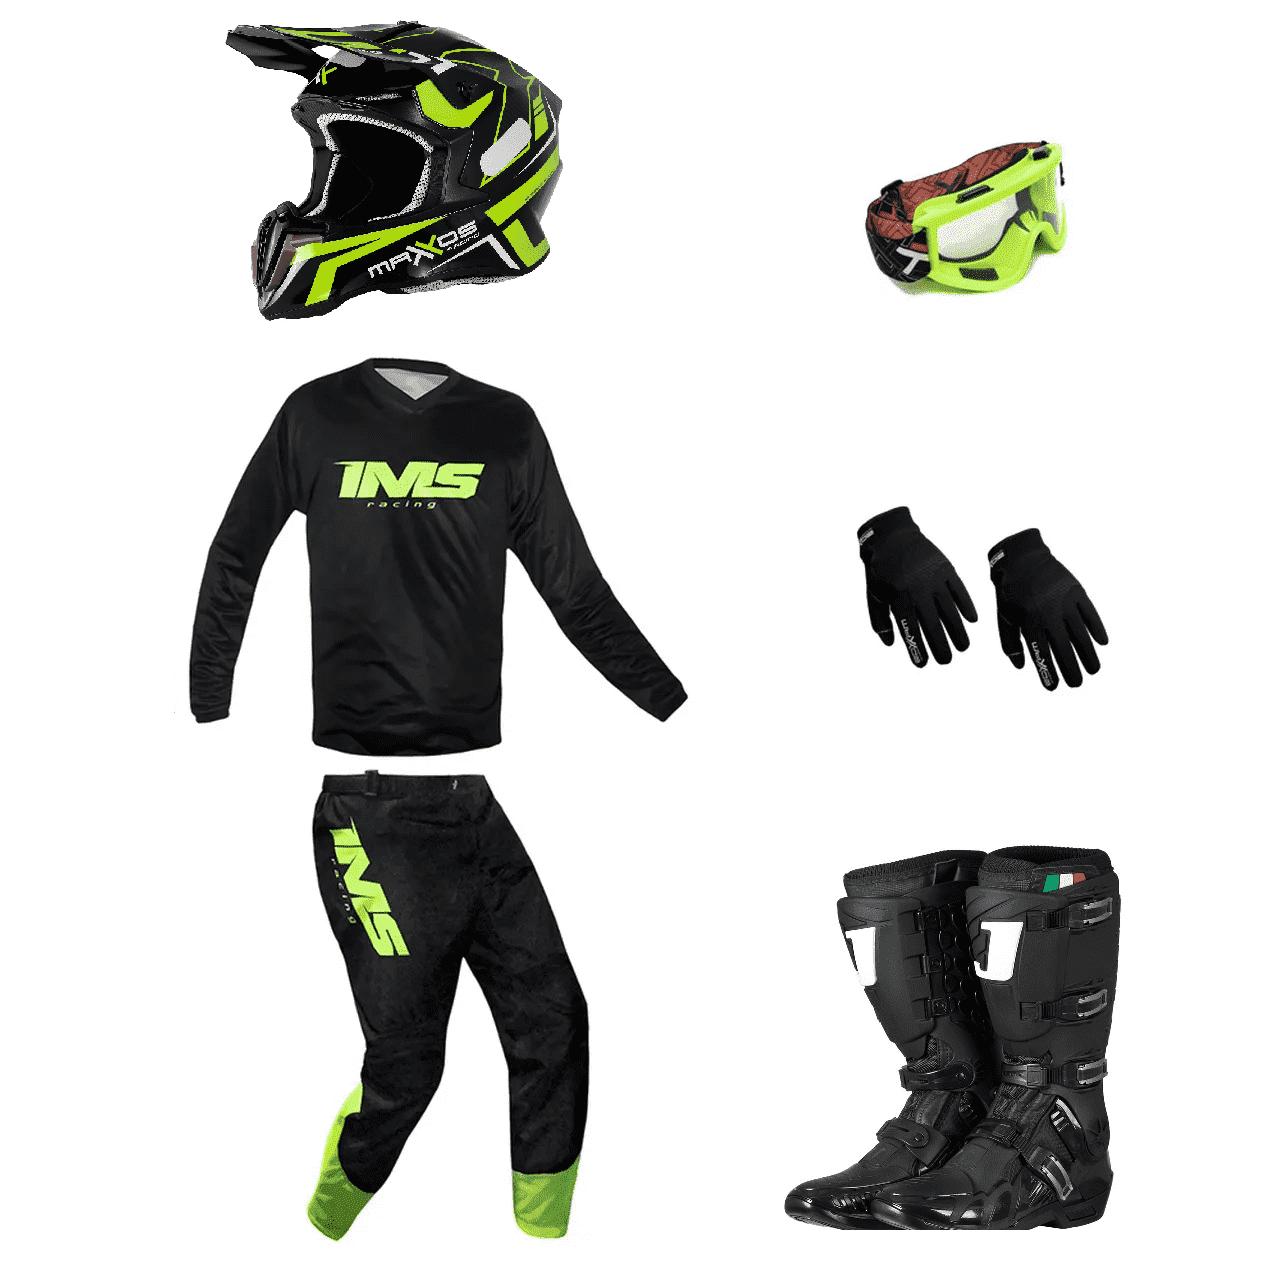 Kit Equipamento Trilha Motocross Enduro Basic 1 - Preto/Fluor